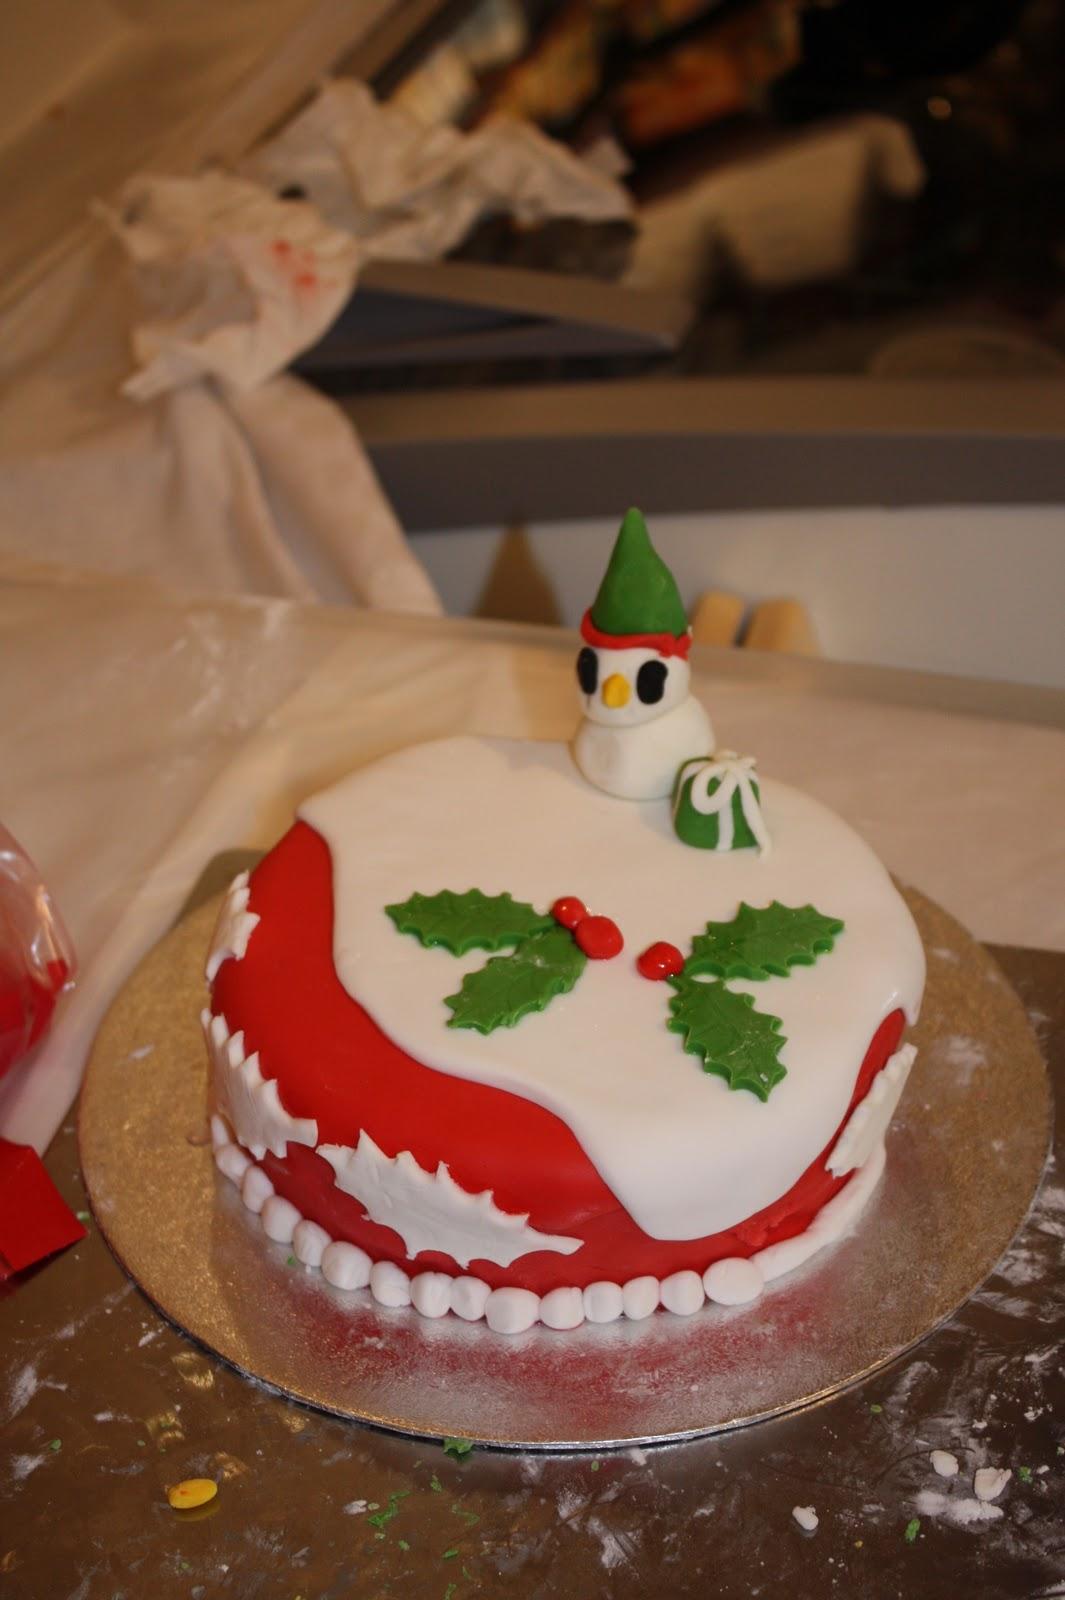 Food Fairies: due fate in cucina: Primo corso di Cake ...